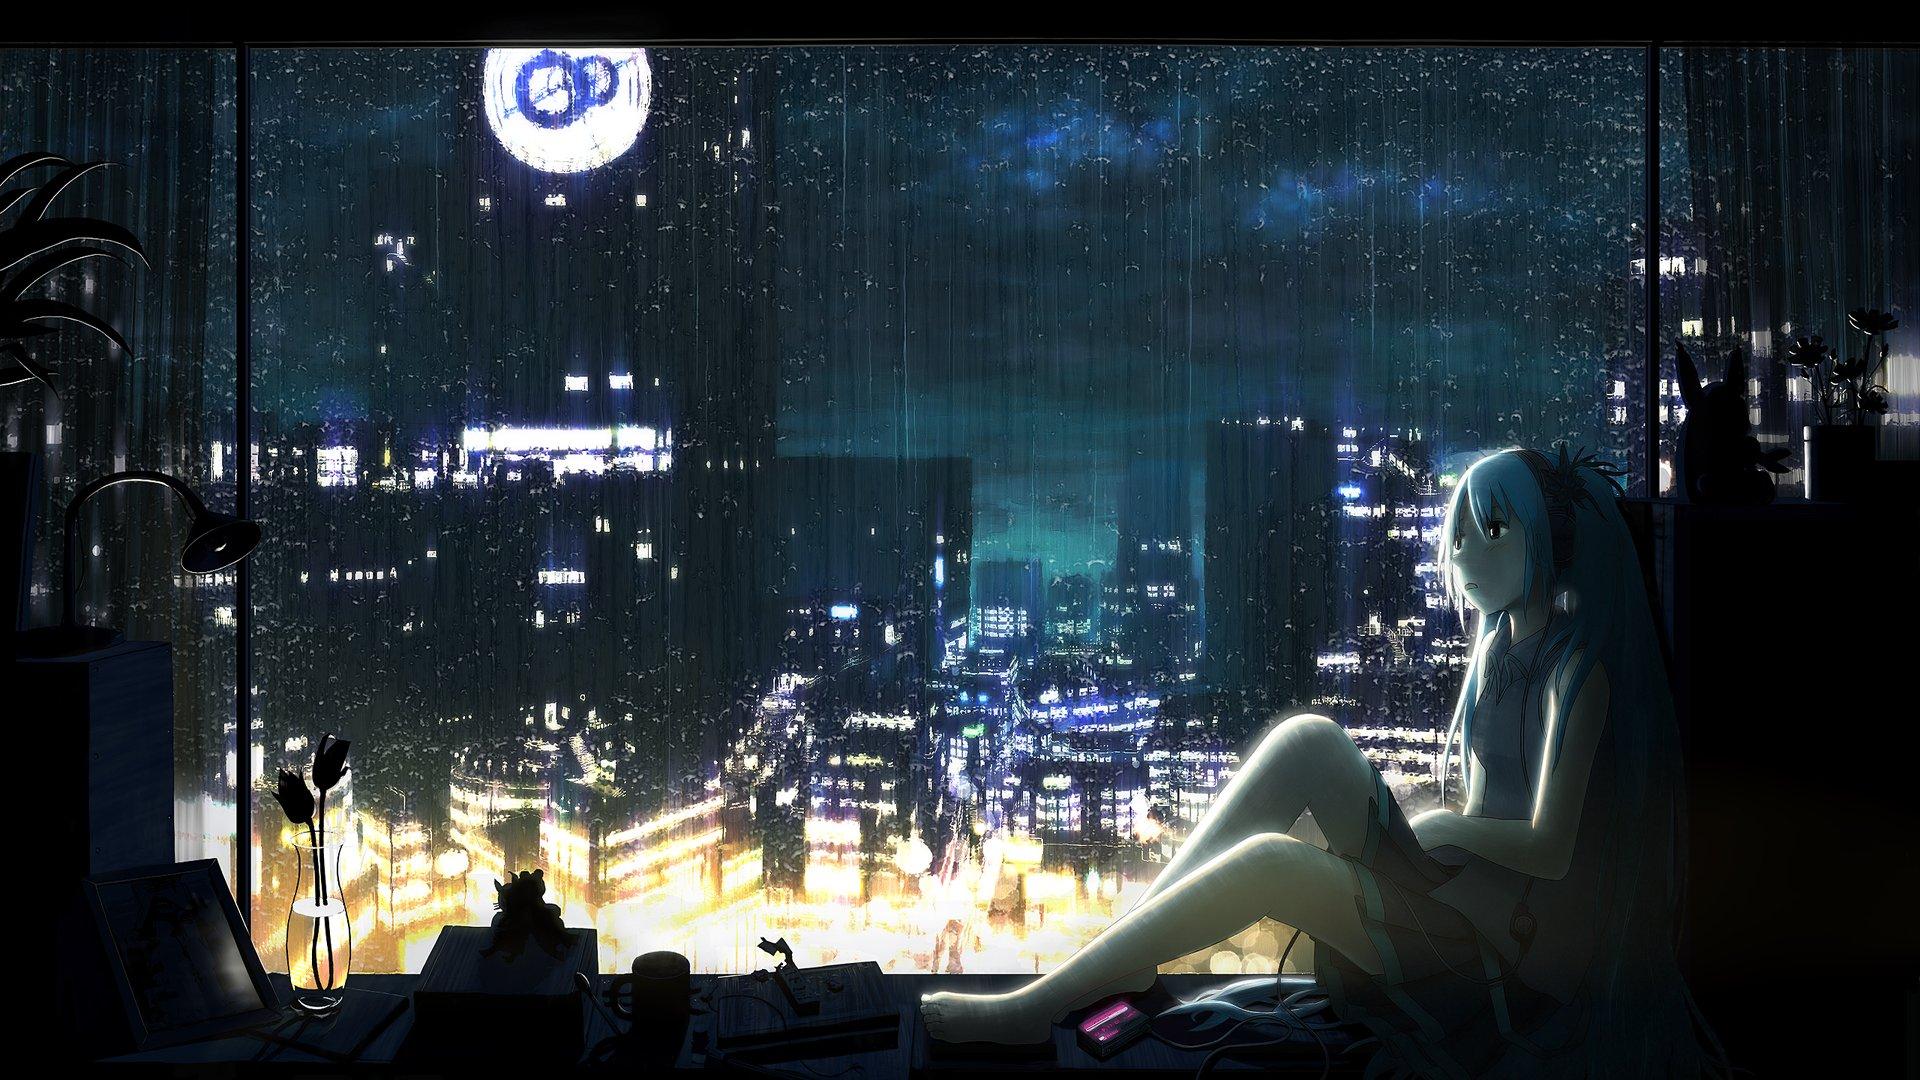 Anime Girls Headphones And Radio 1920x1080 Wallpaper 8tracks Online Radio Stream 17 Playlists By